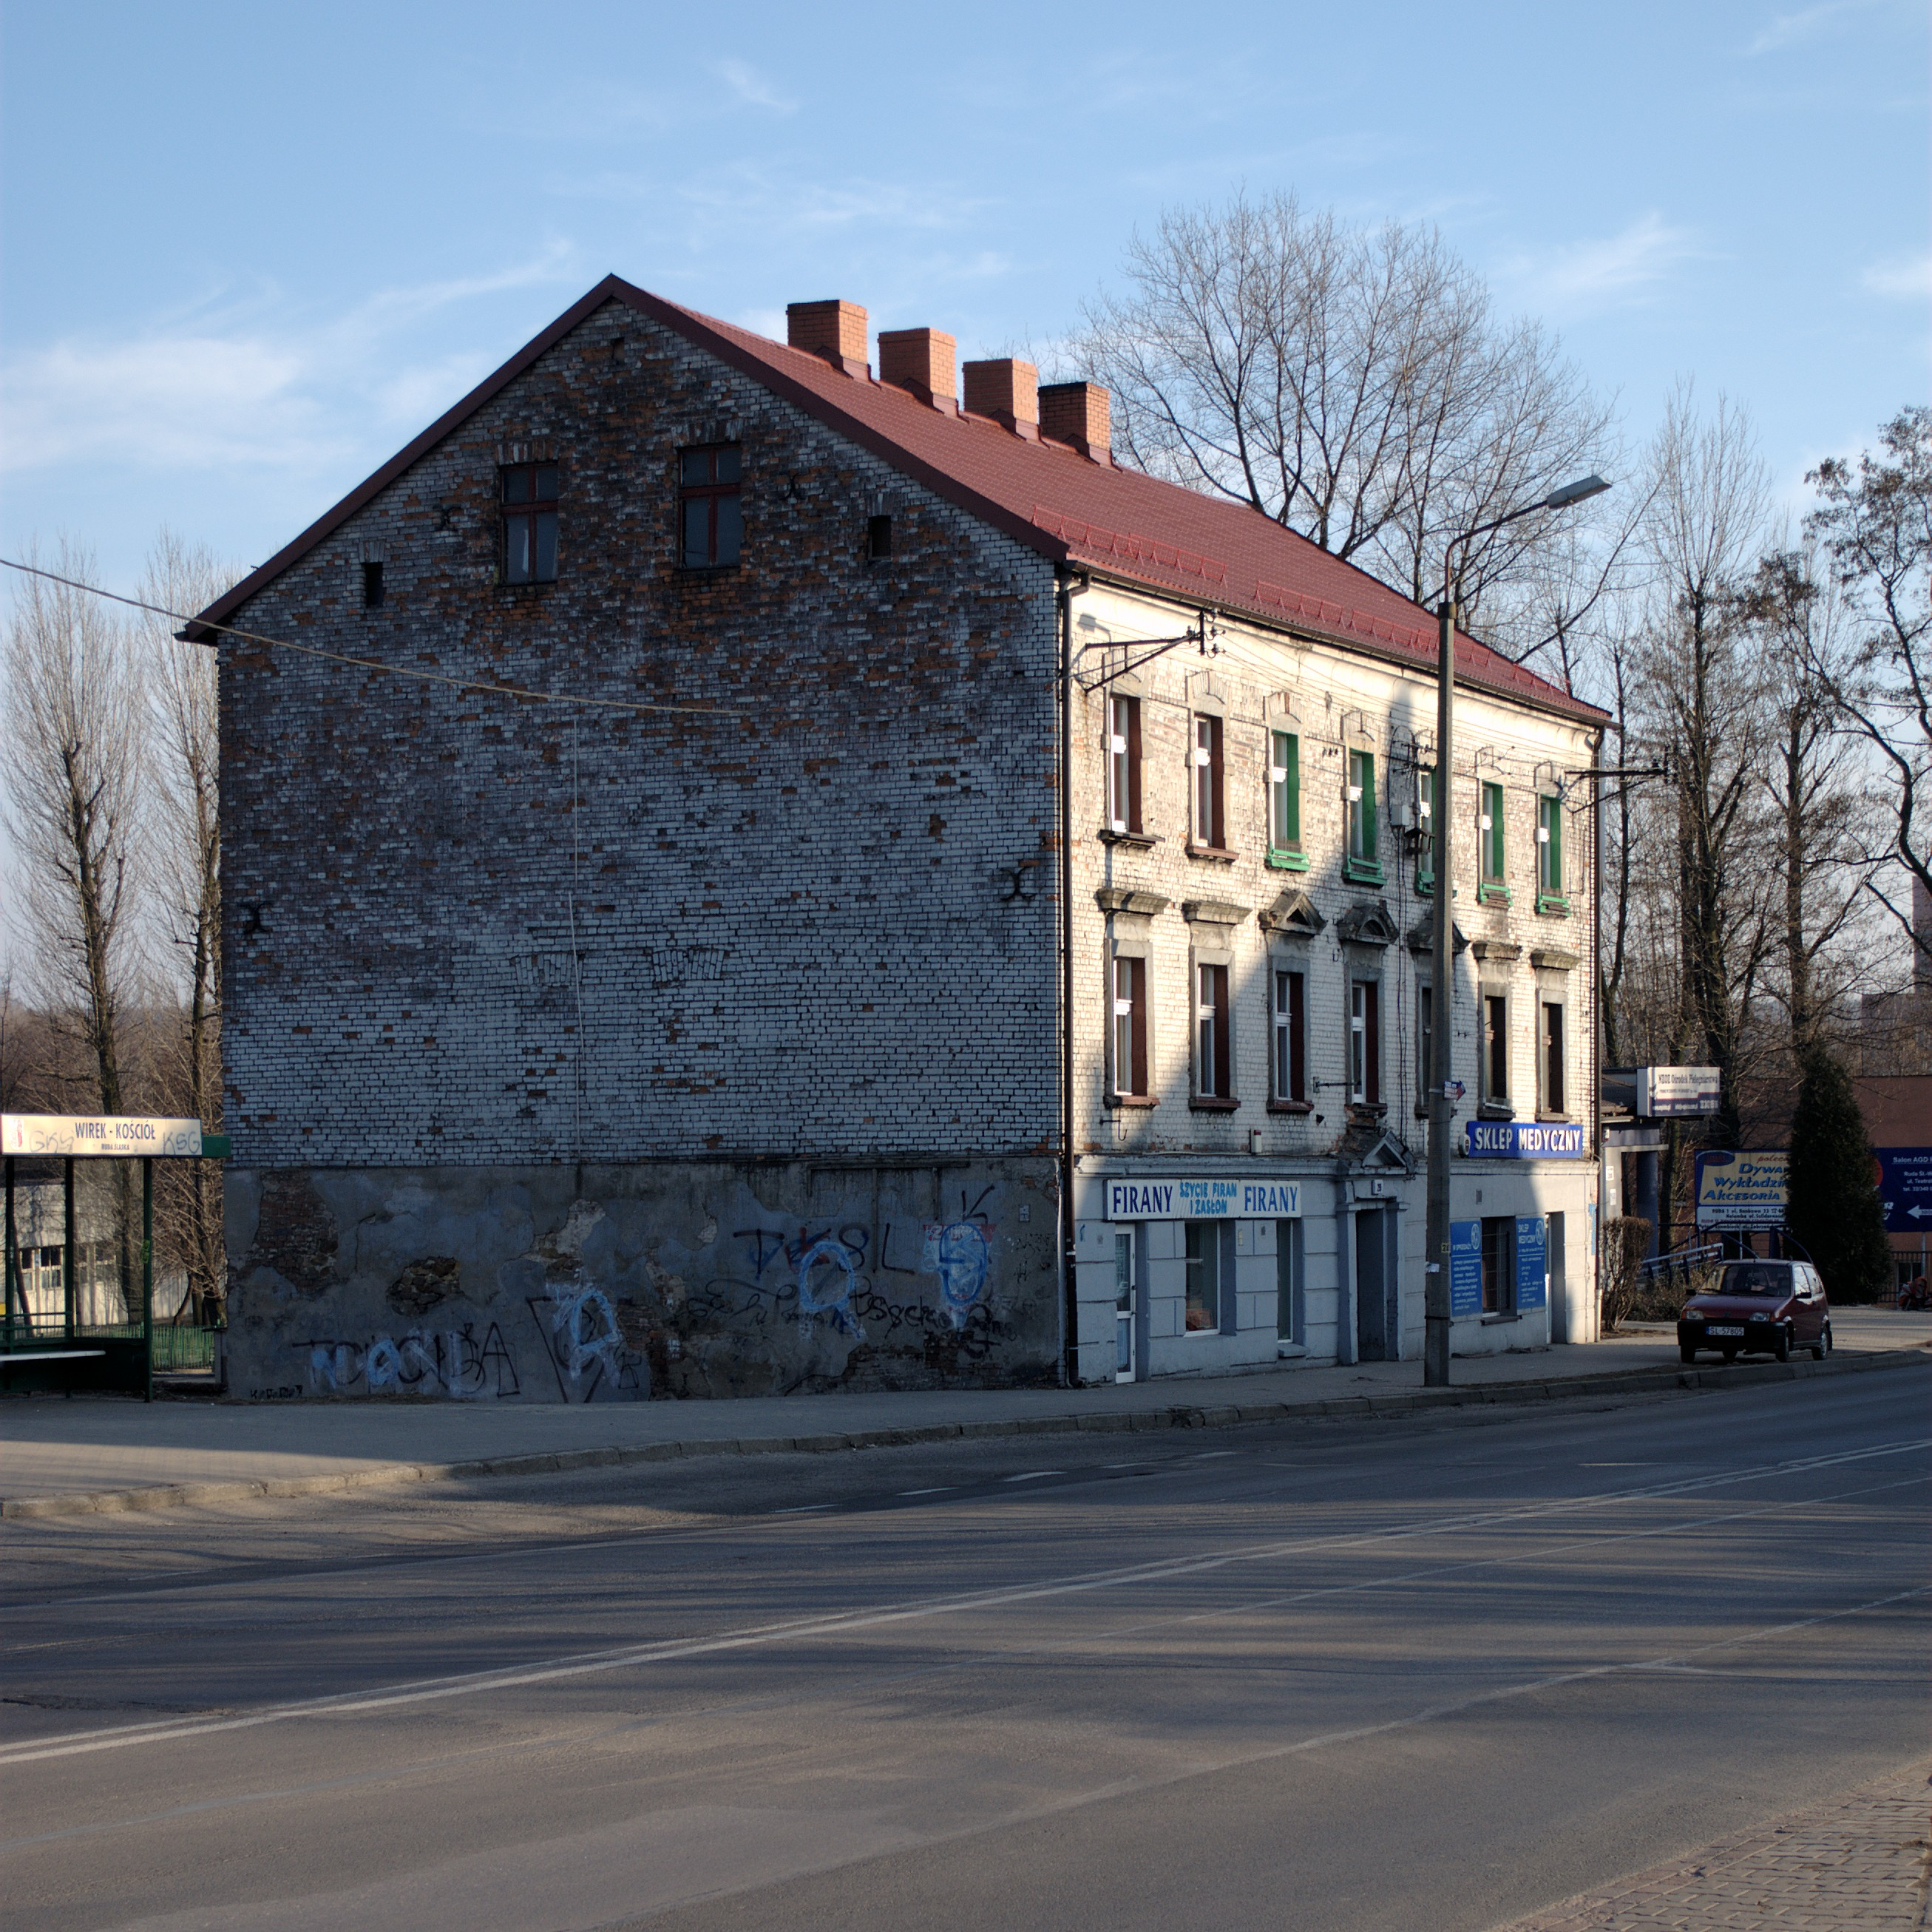 Fileruda śląska 1 Maja 290 Dsc 7260jpg Wikimedia Commons